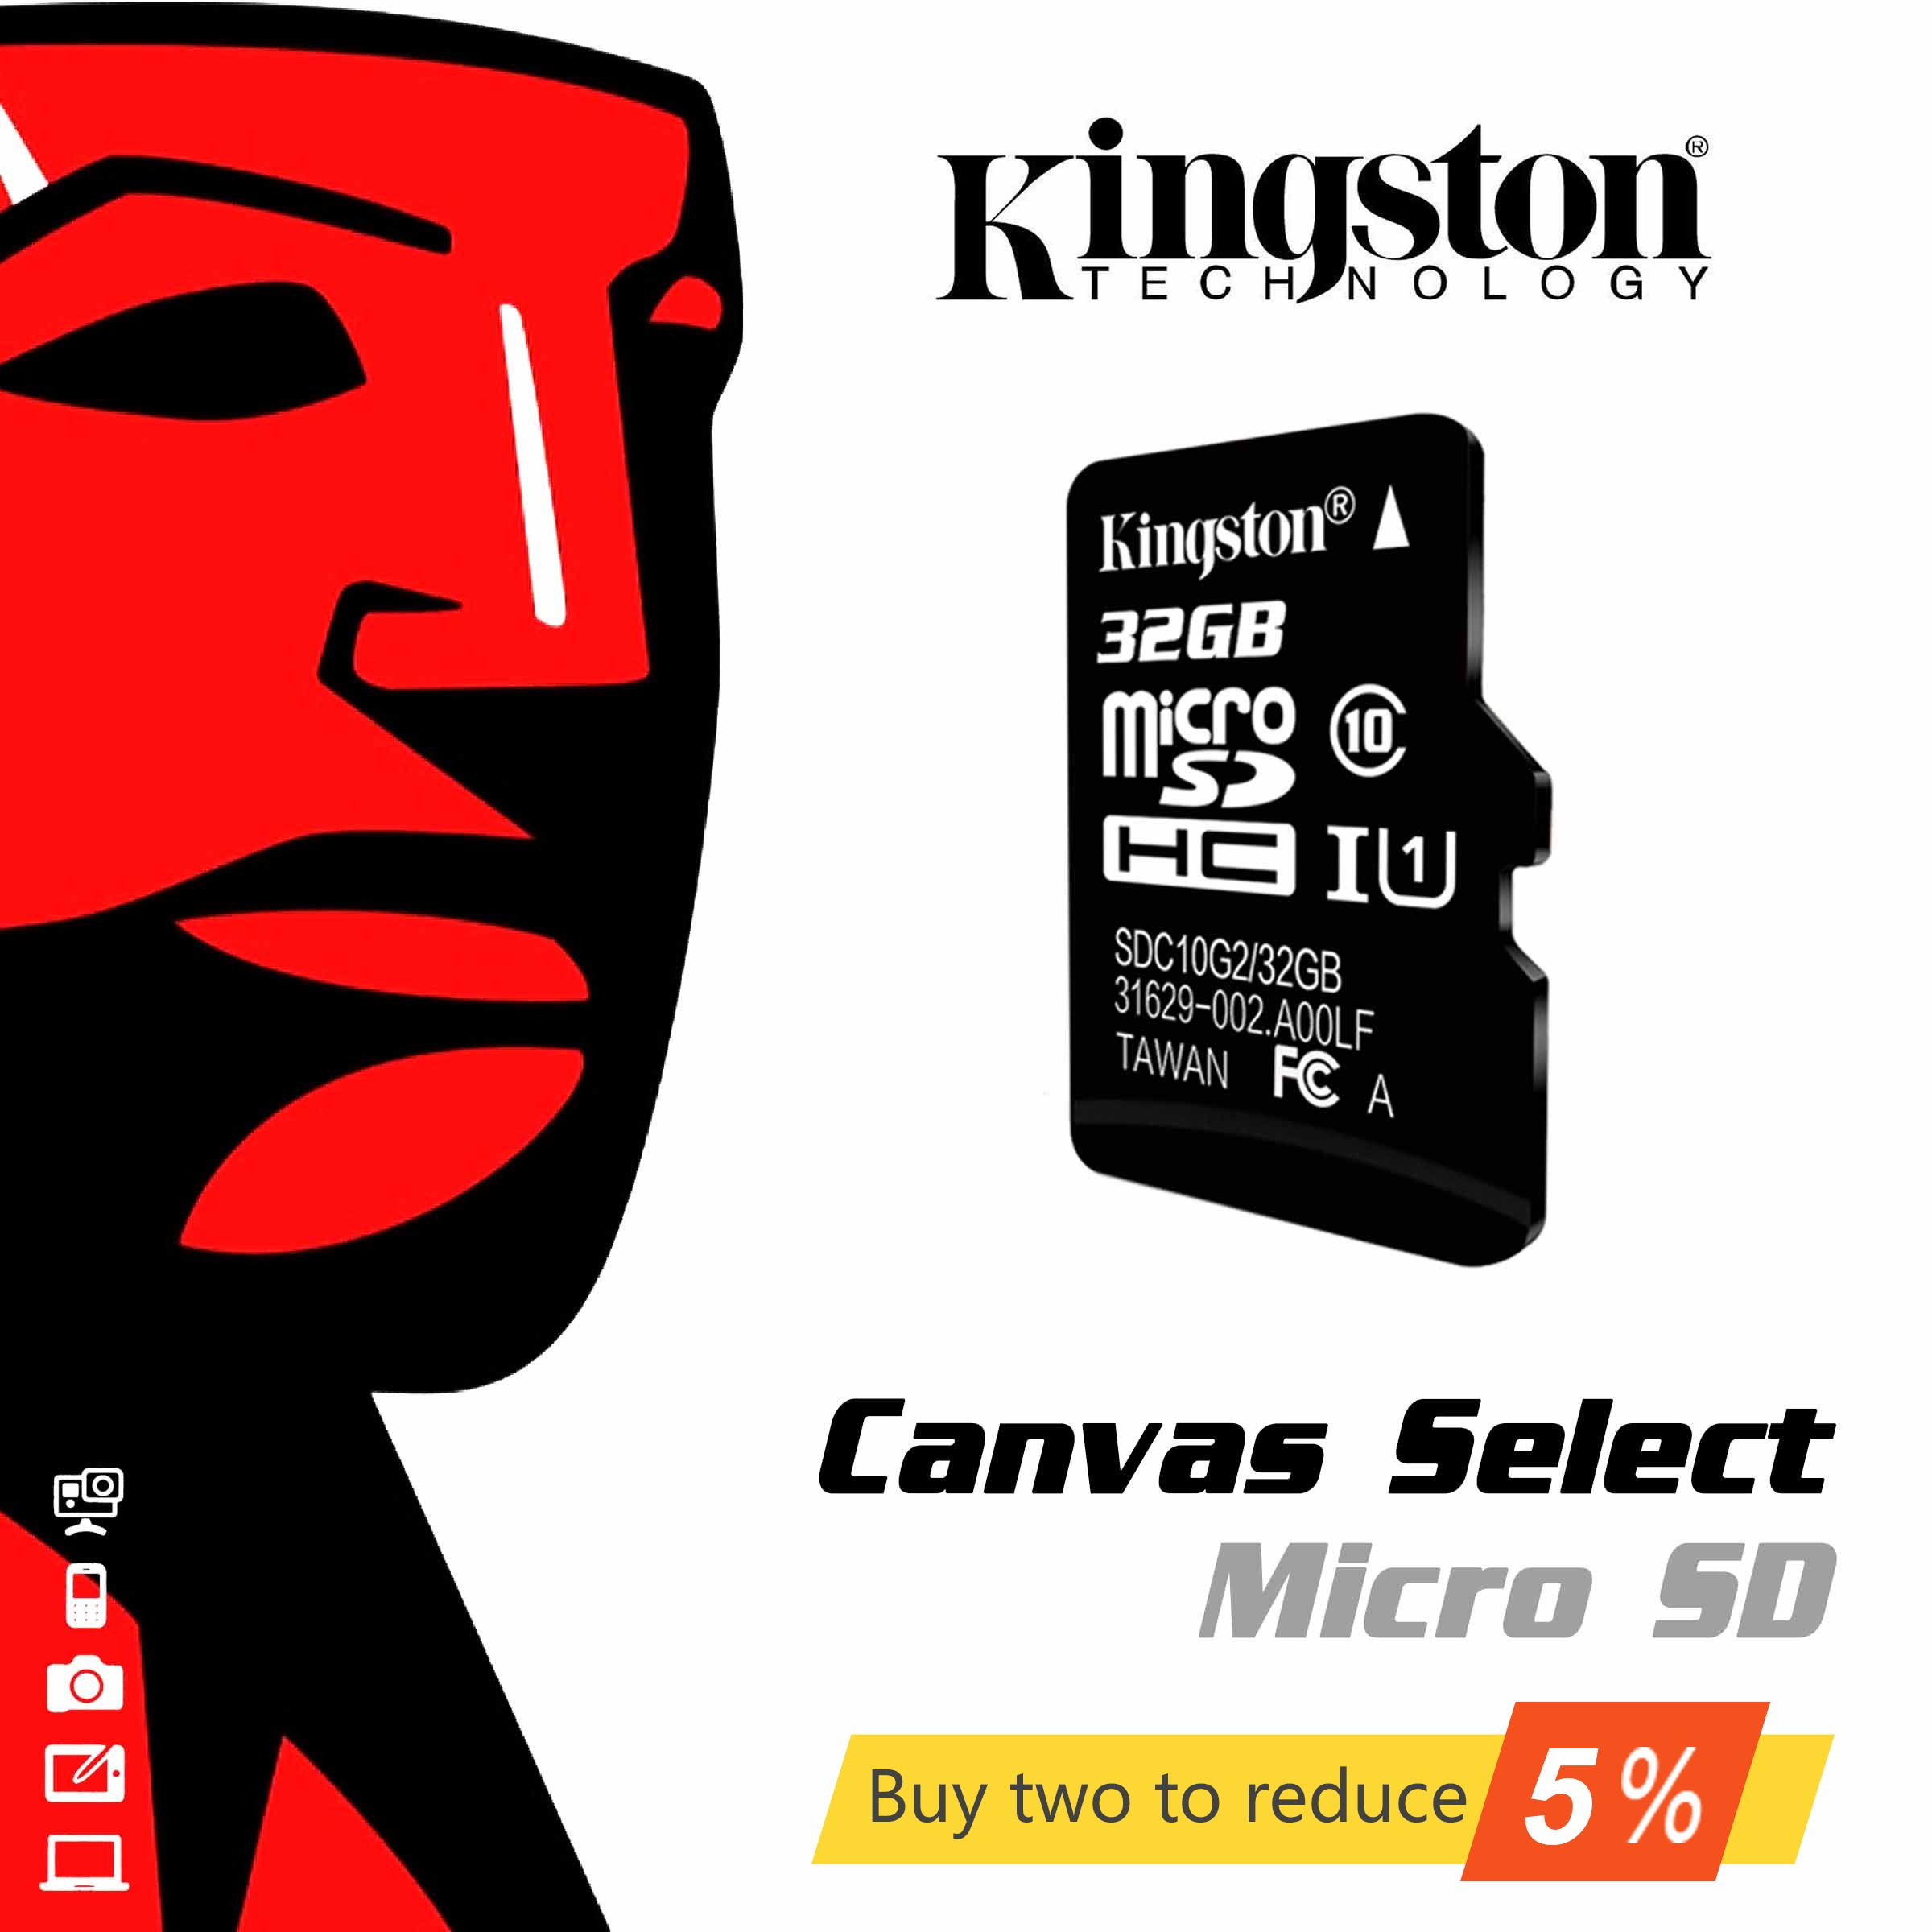 Оригинальная карта памяти Kingston Class 10 Micro SD 32 Гб MicroSDHC UHS-I карта памяти TF 8 ГБ 16 ГБ 32 ГБ 64 Гб 128 ГБ